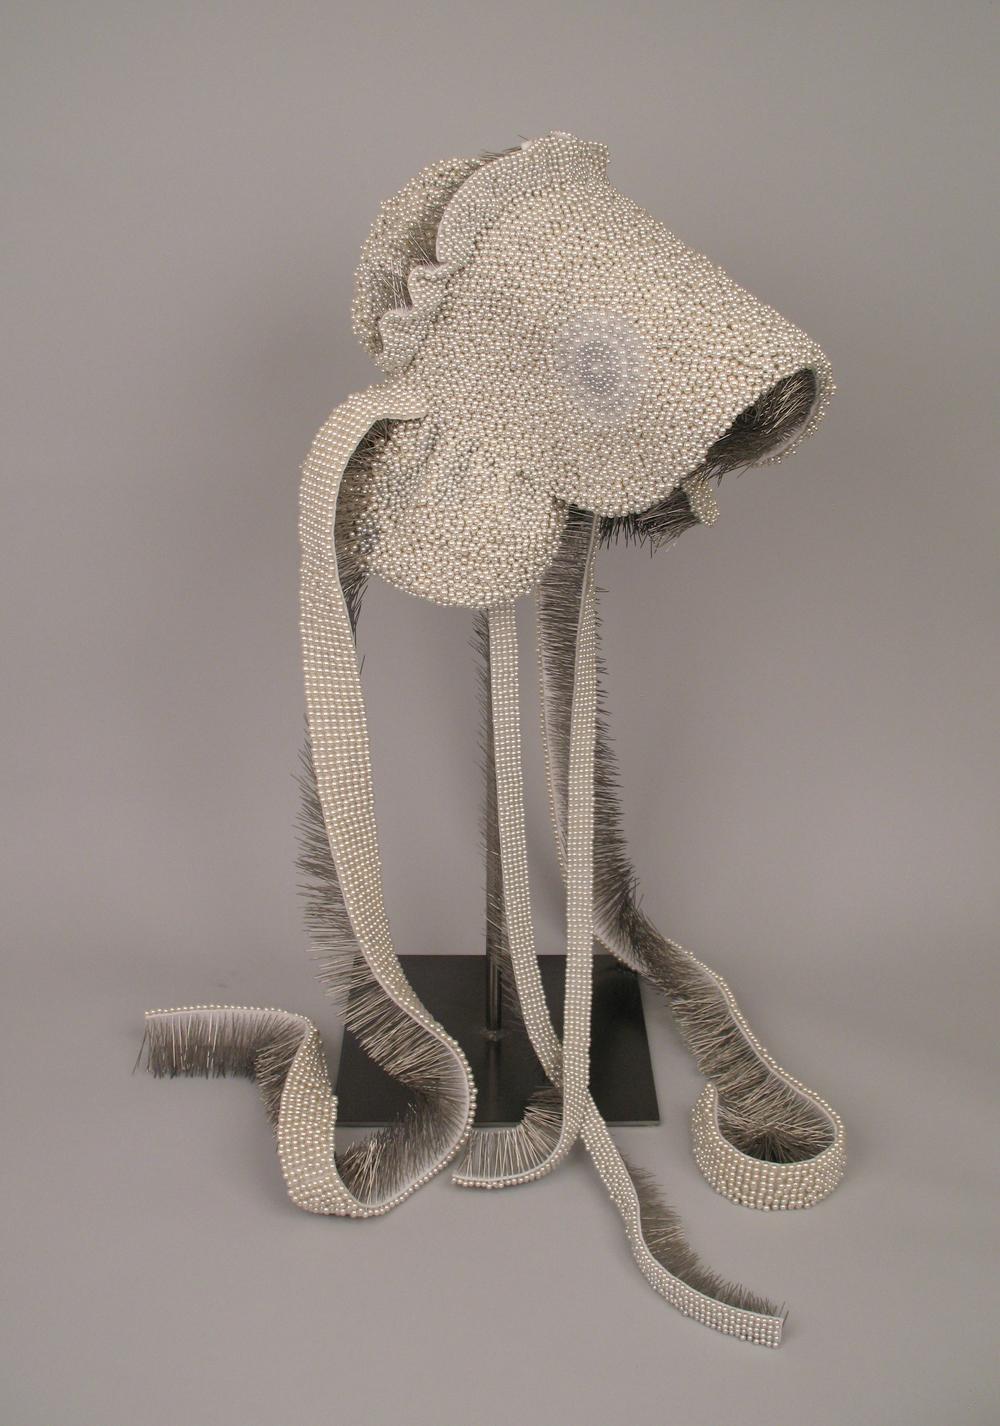 "Seer Bonnet IX (Sylvia)  19,952 pearl corsage pins, fabric, steel, 28.5"" x 12"" x 15"", 2010"